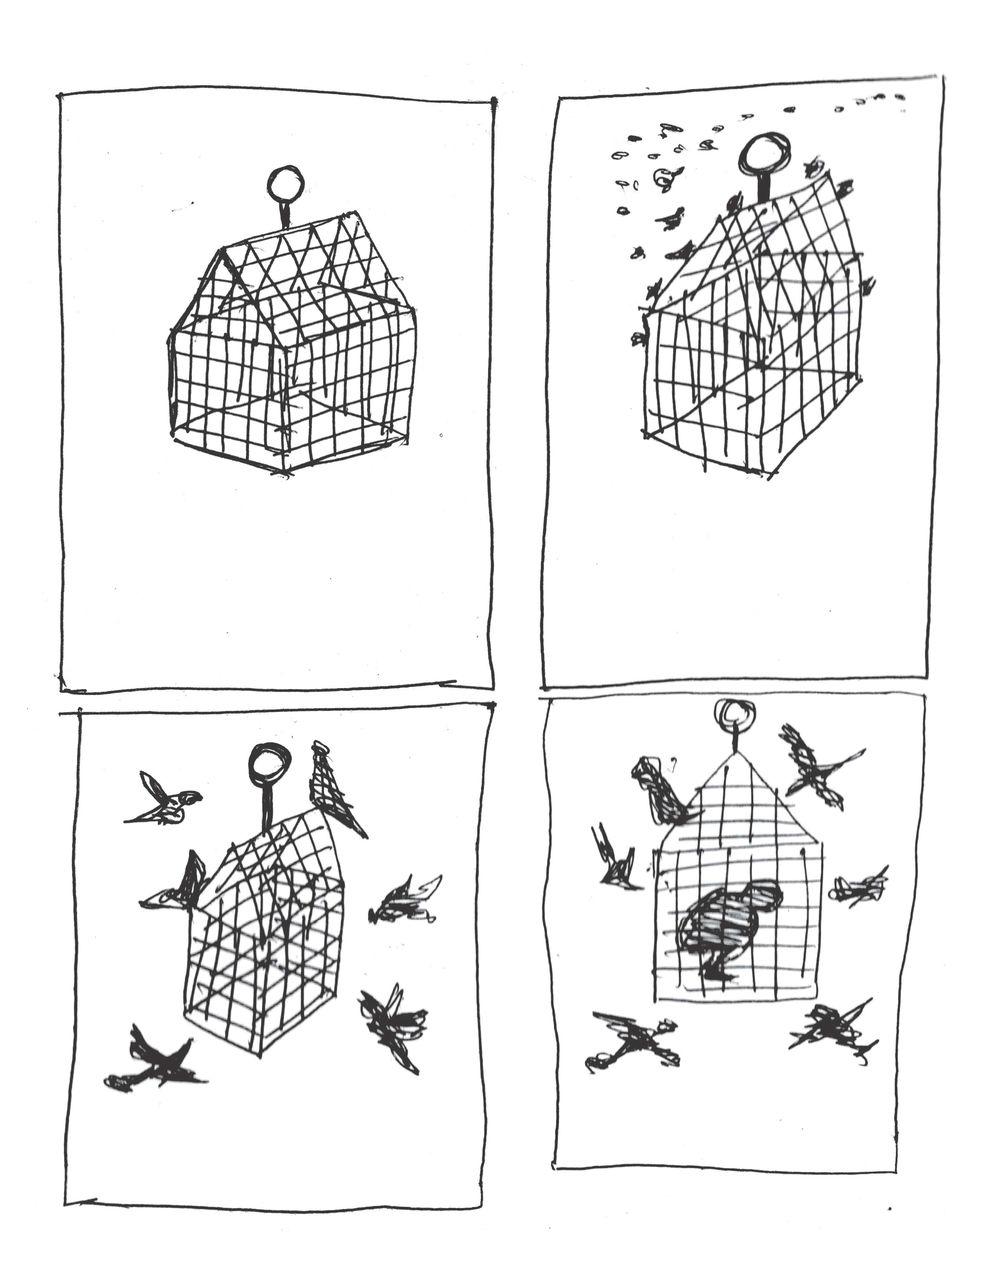 Ellen's Designs for The Birds - image 3 - student project